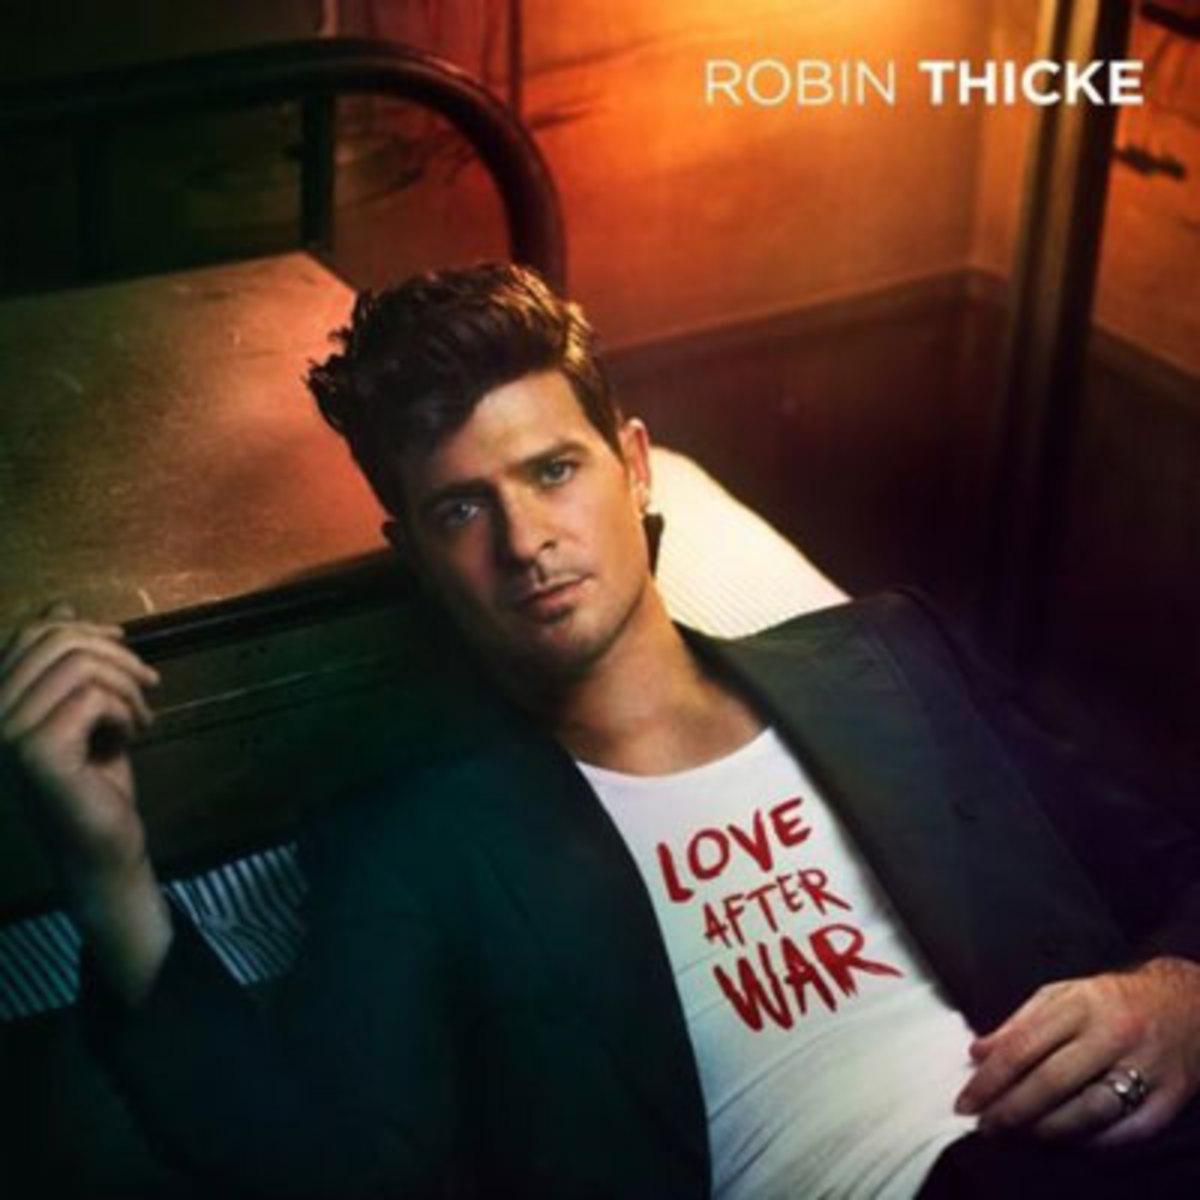 robinthicke-loveafterwar.jpg